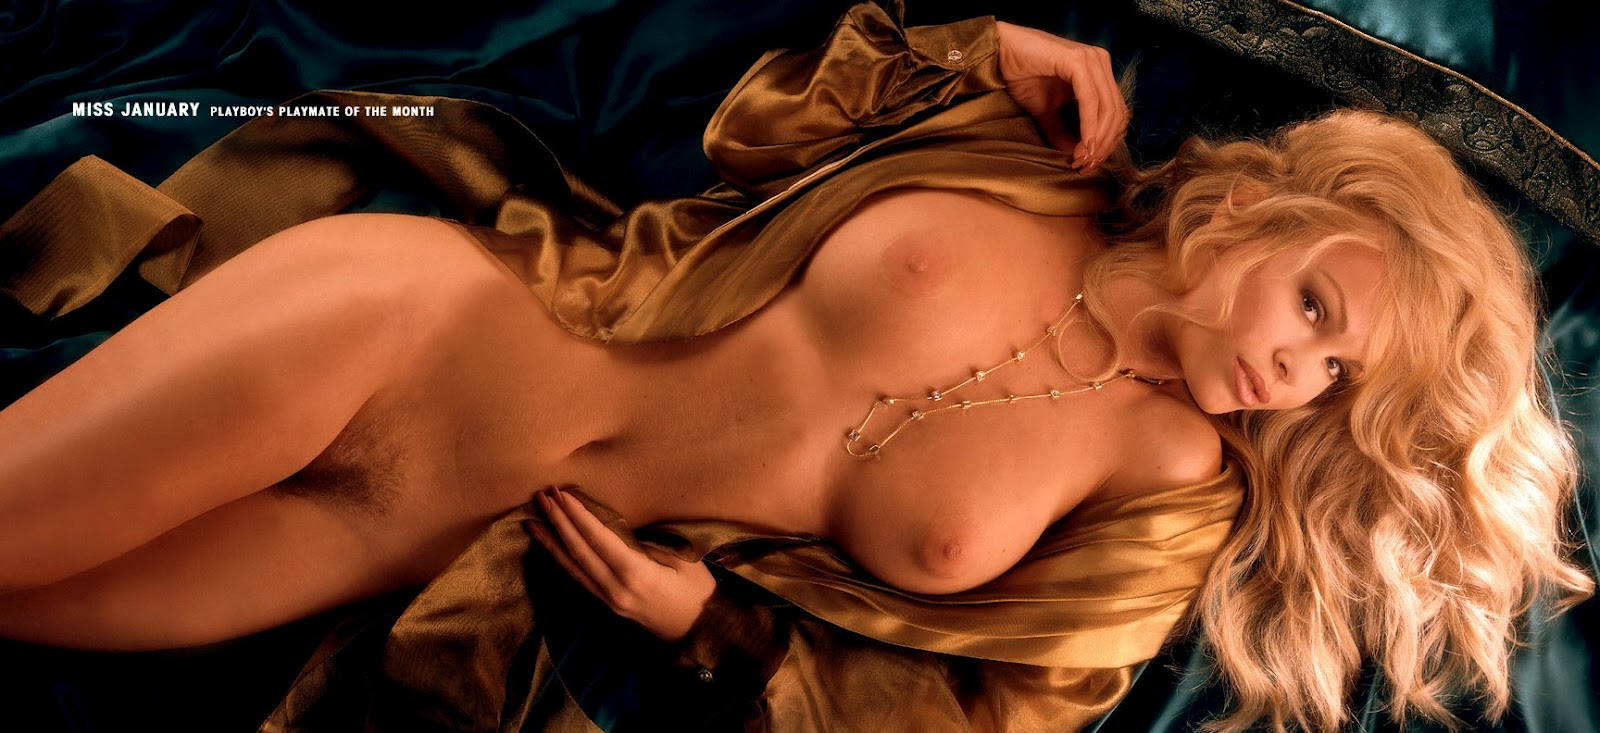 Assinnude nude movies